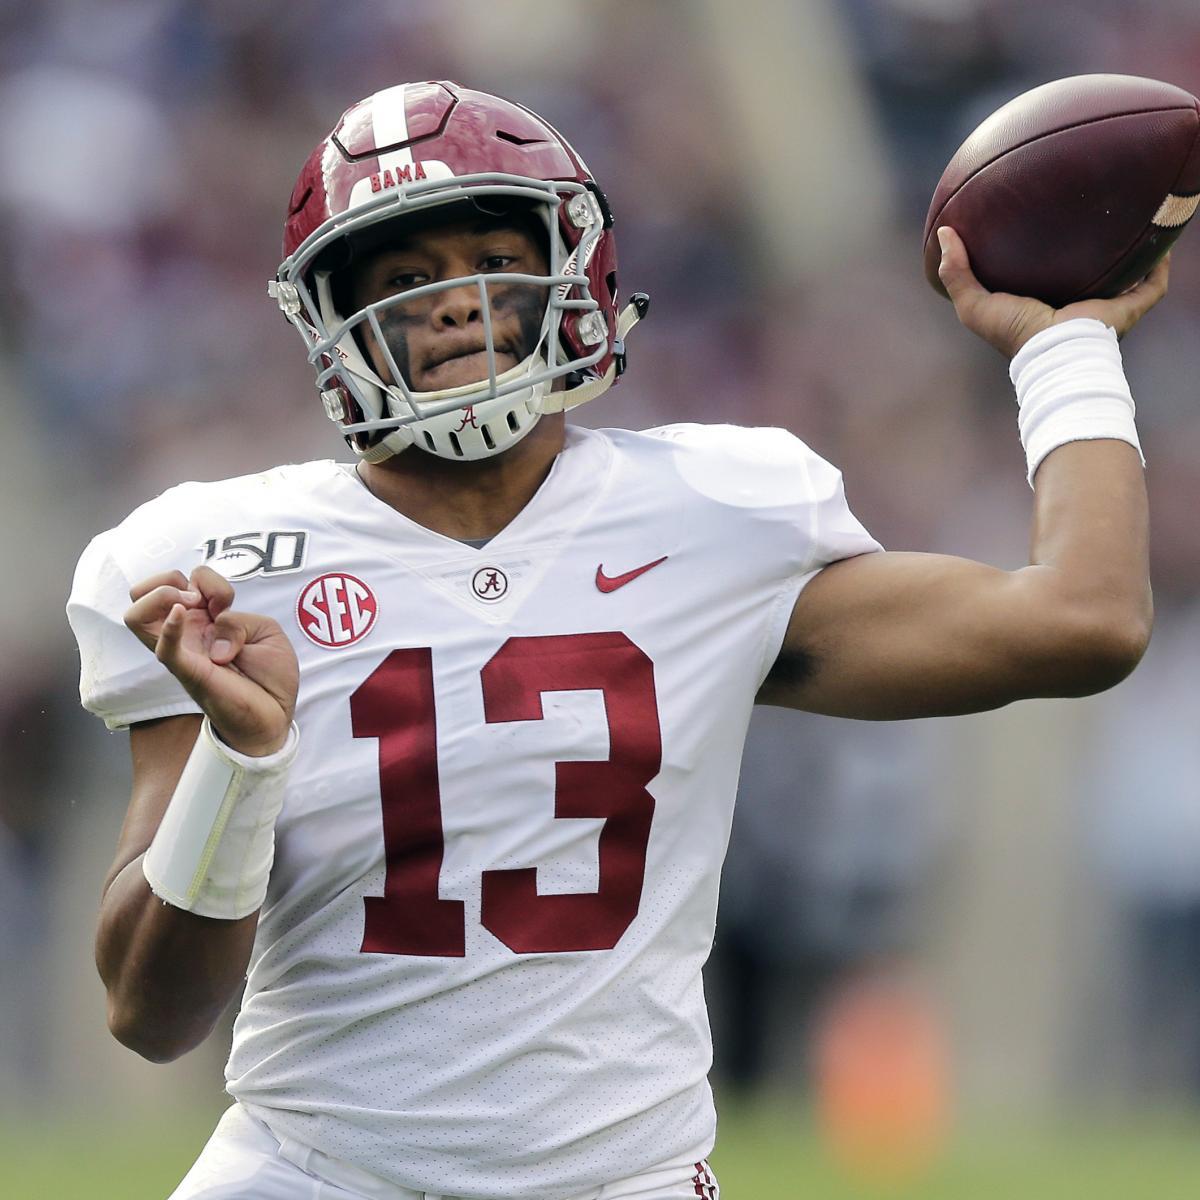 Redskins Rumors: Drafting a QB No. 2 'Very Real Possibility' Amid Tua Buzz